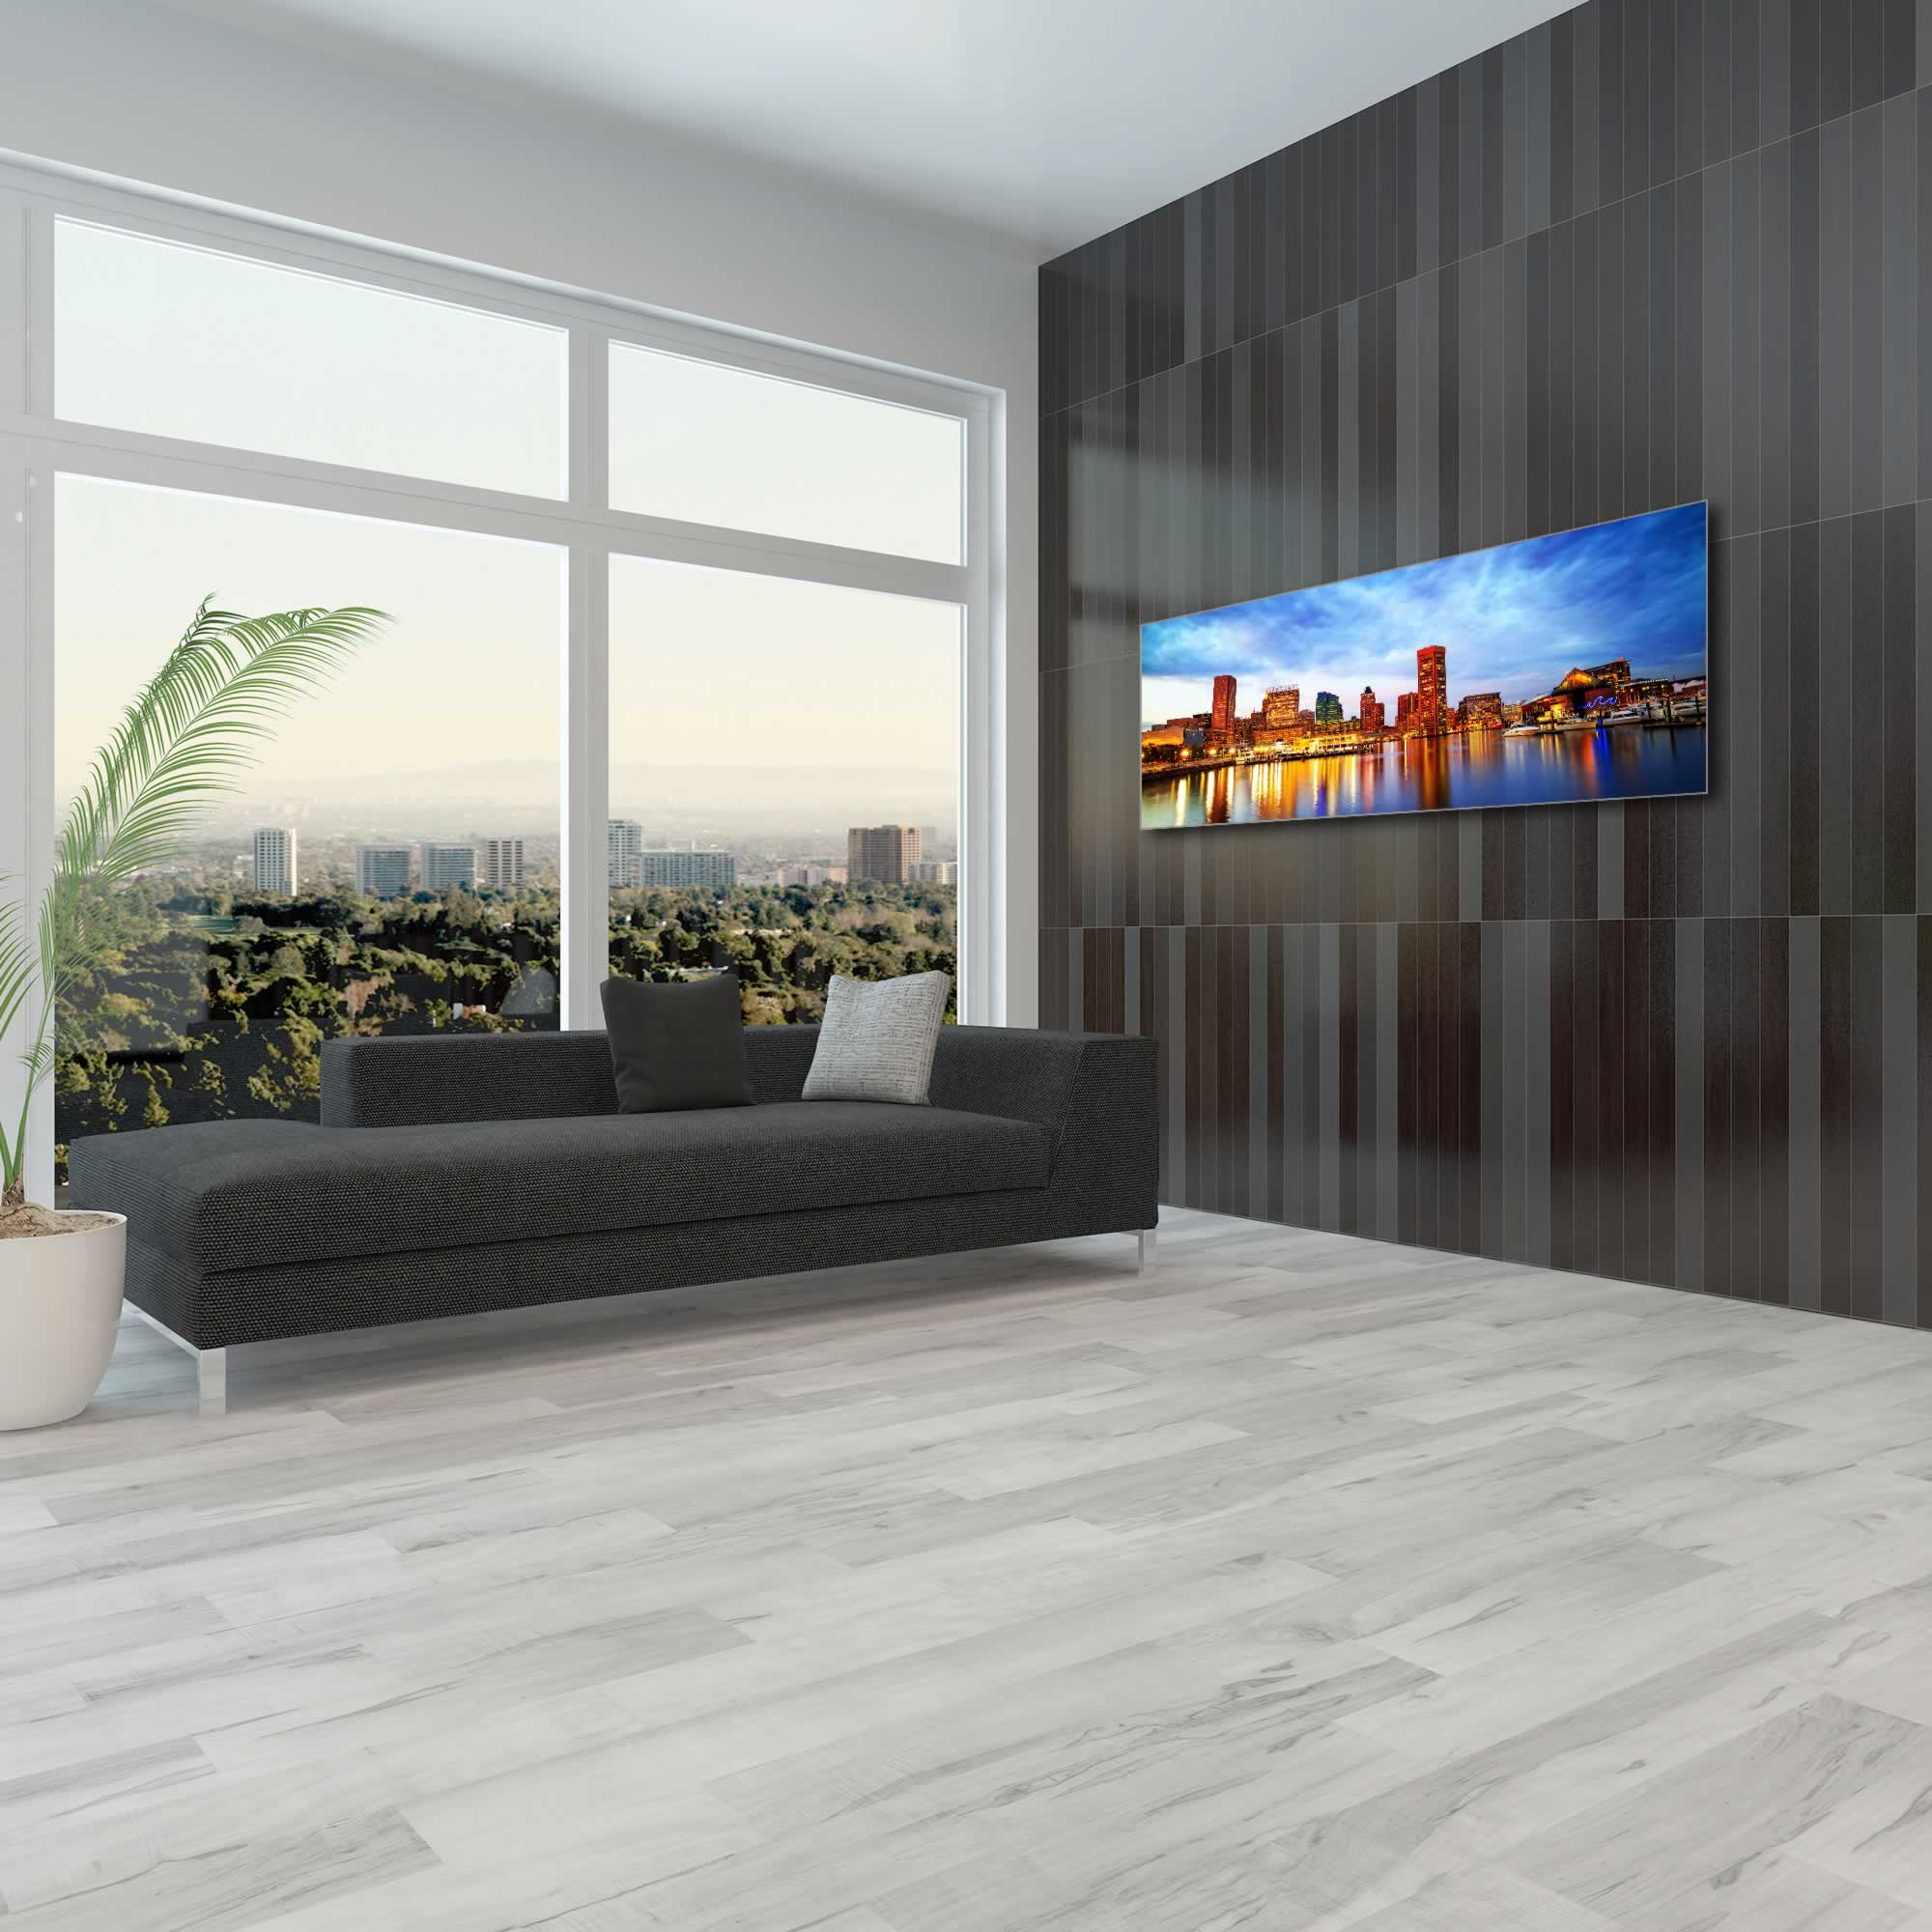 Baltimore City Skyline - Urban Modern Art, Designer Home Decor, Cityscape Wall Artwork, Trendy Contemporary Art - Alternate View 1